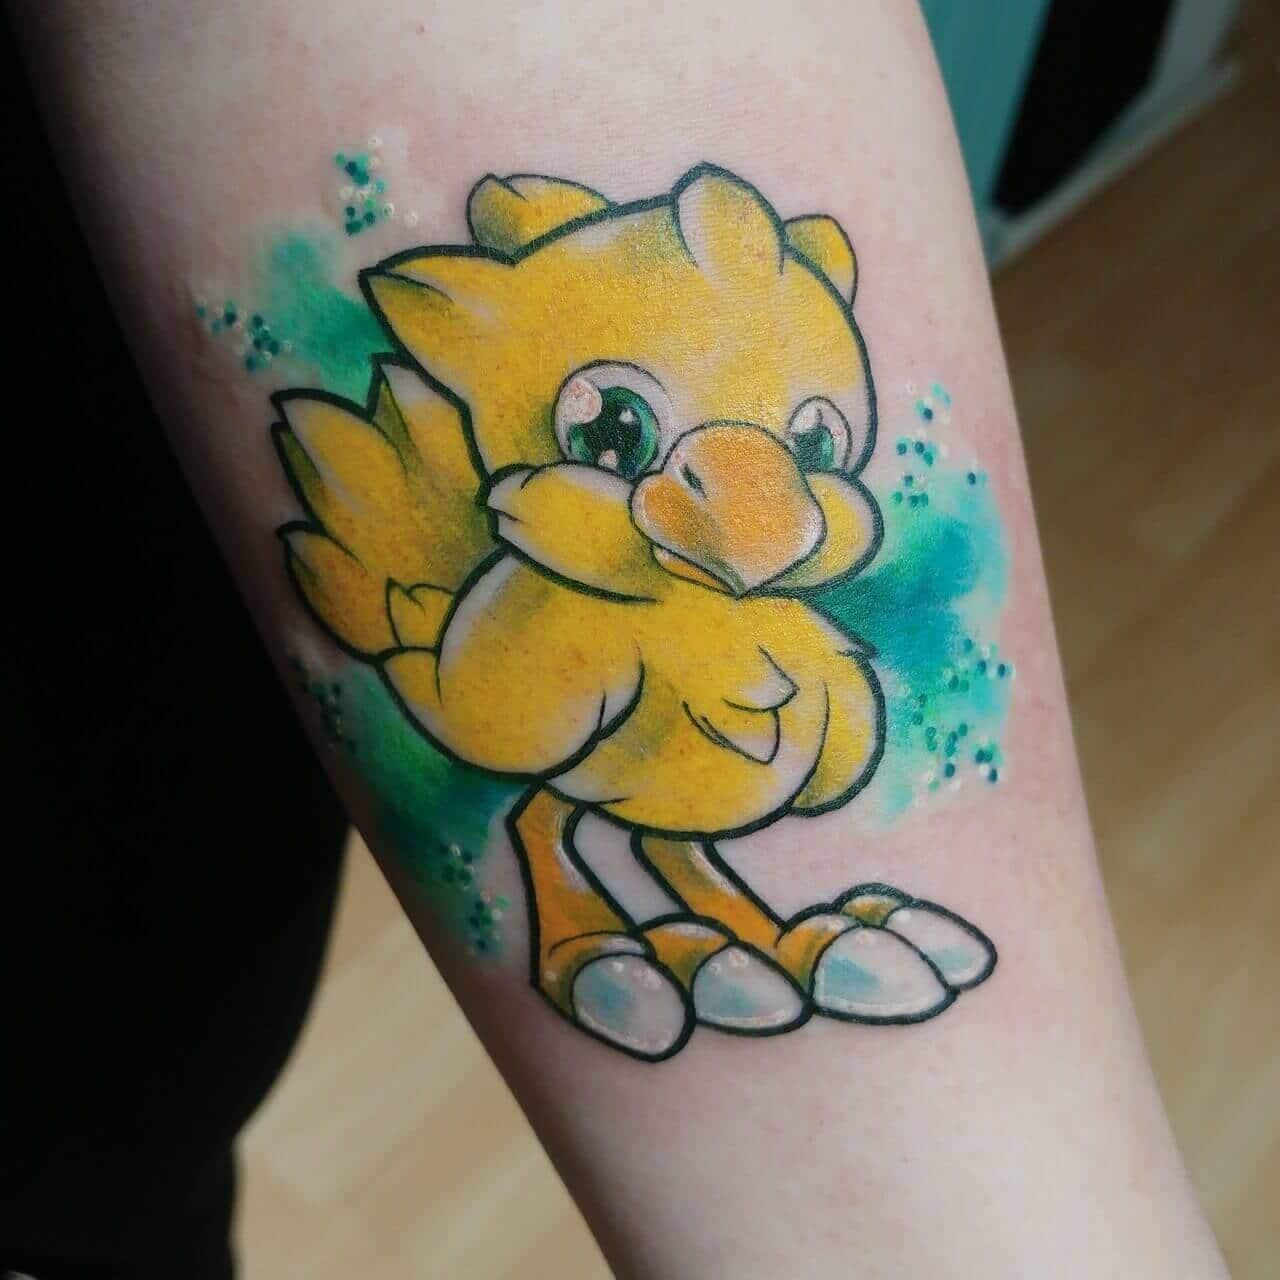 chocobo tattoo on arm